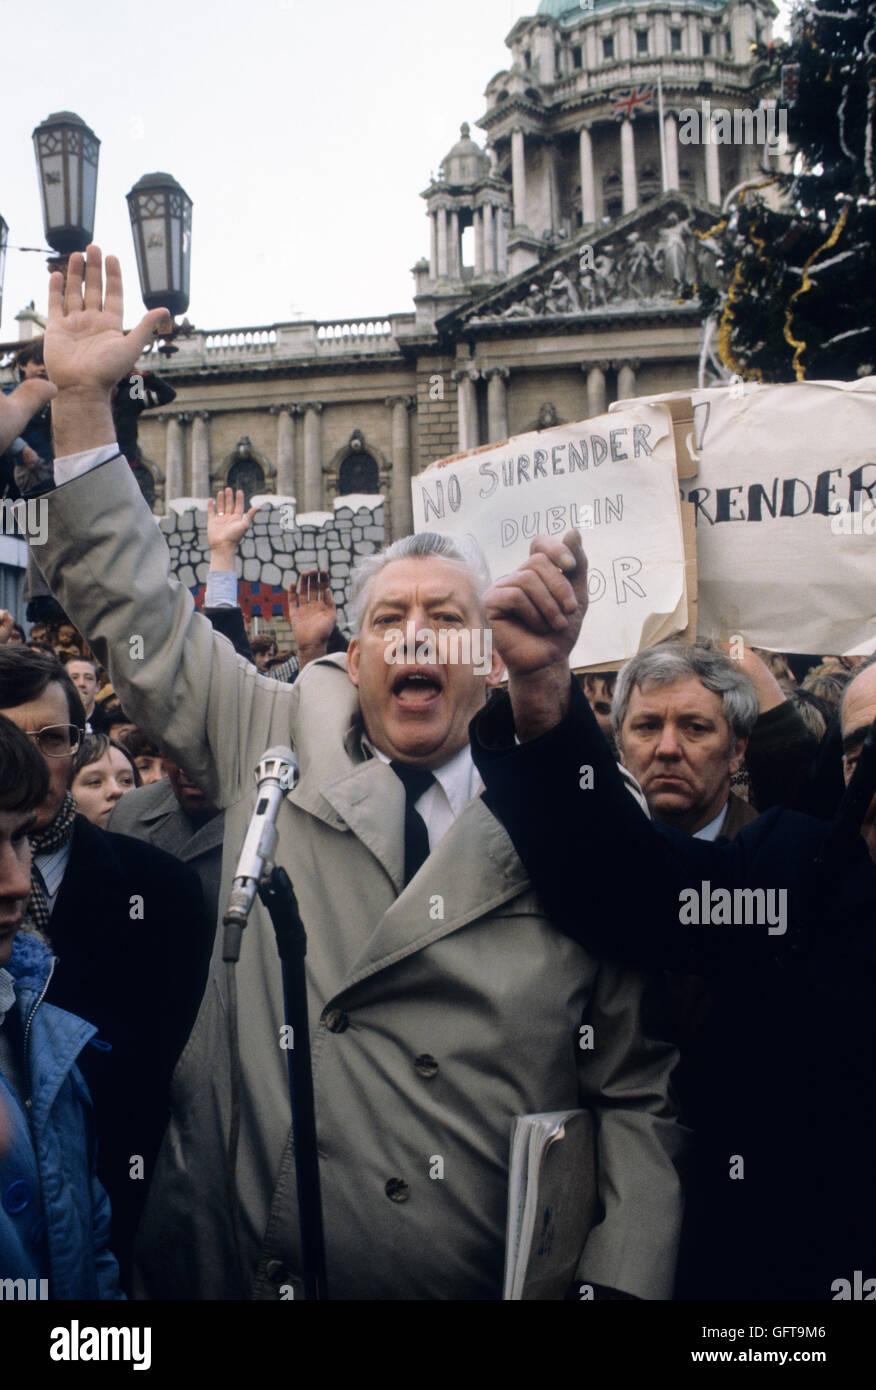 Rev 'Ian Paisley' 'Northern Ireland' 'No Surrender' banners. 1981 HOMER SYKES - Stock Image